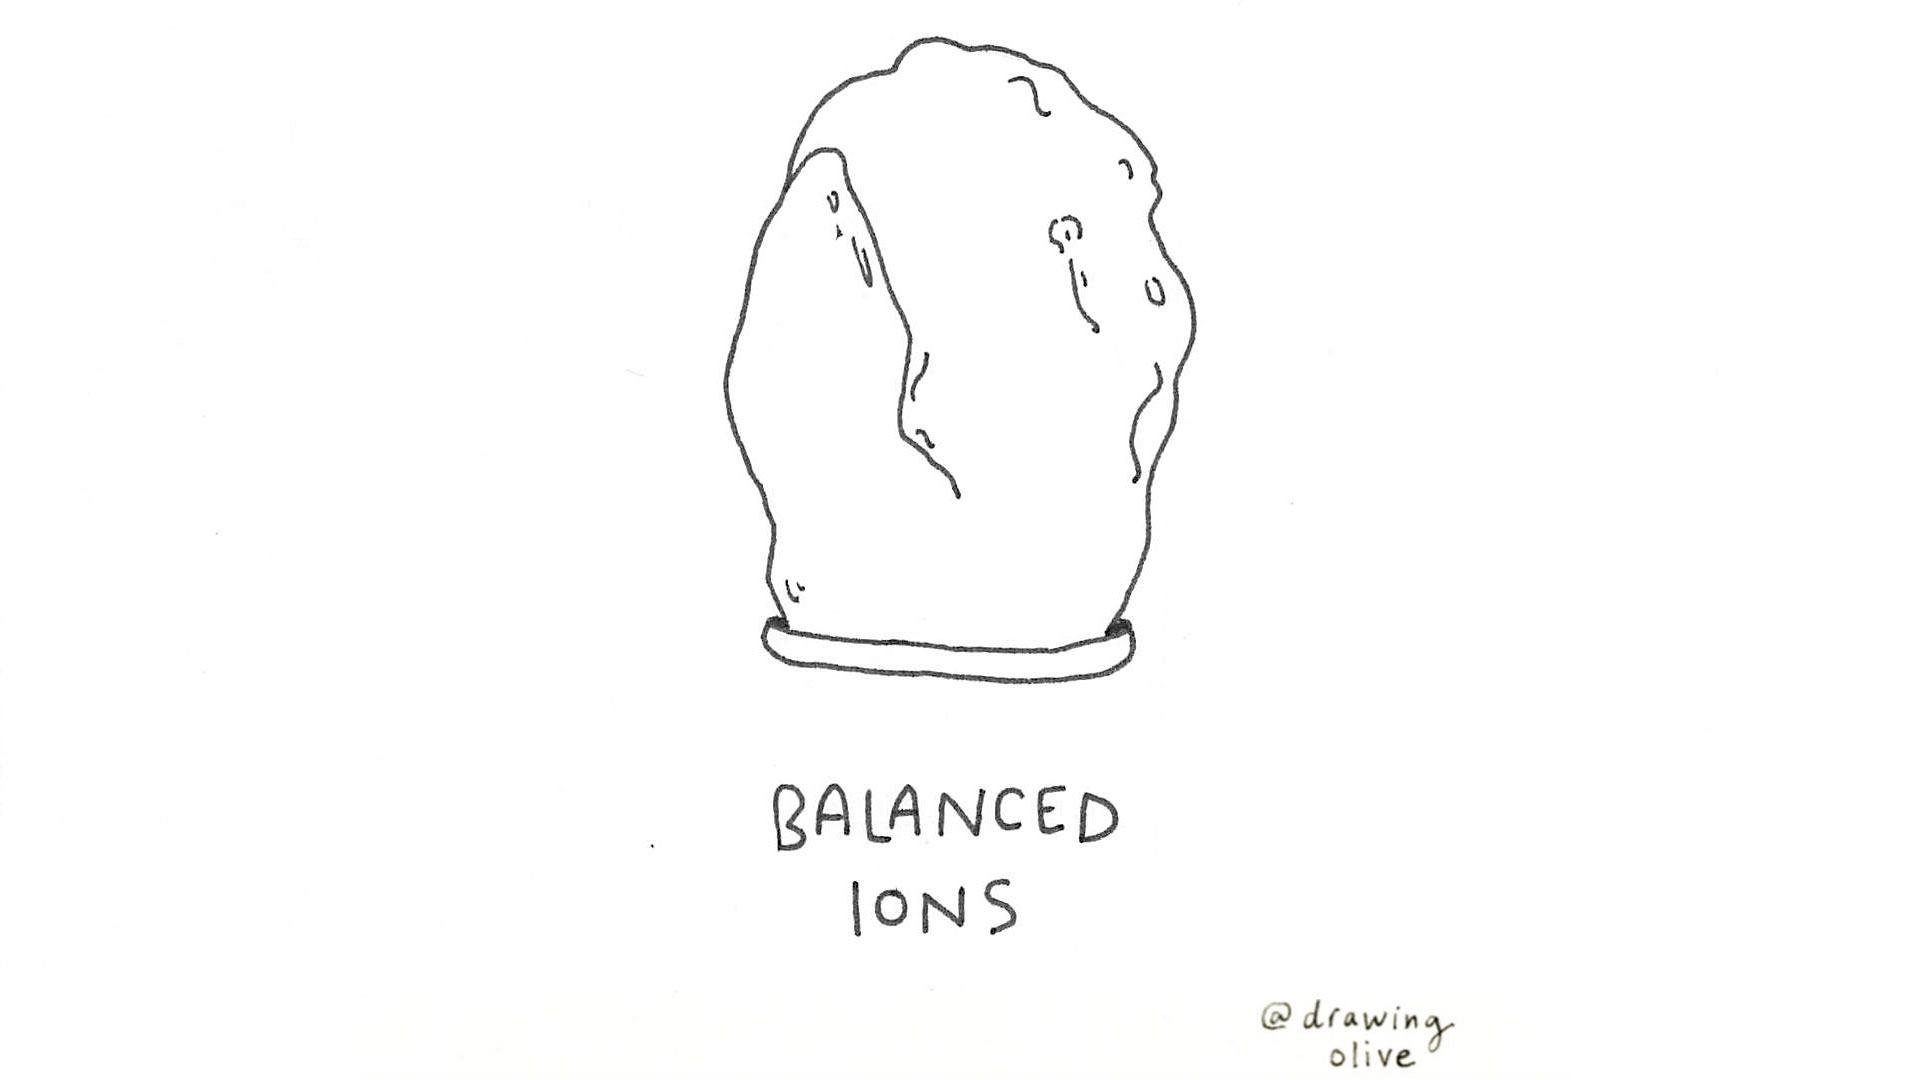 Balanced Ions